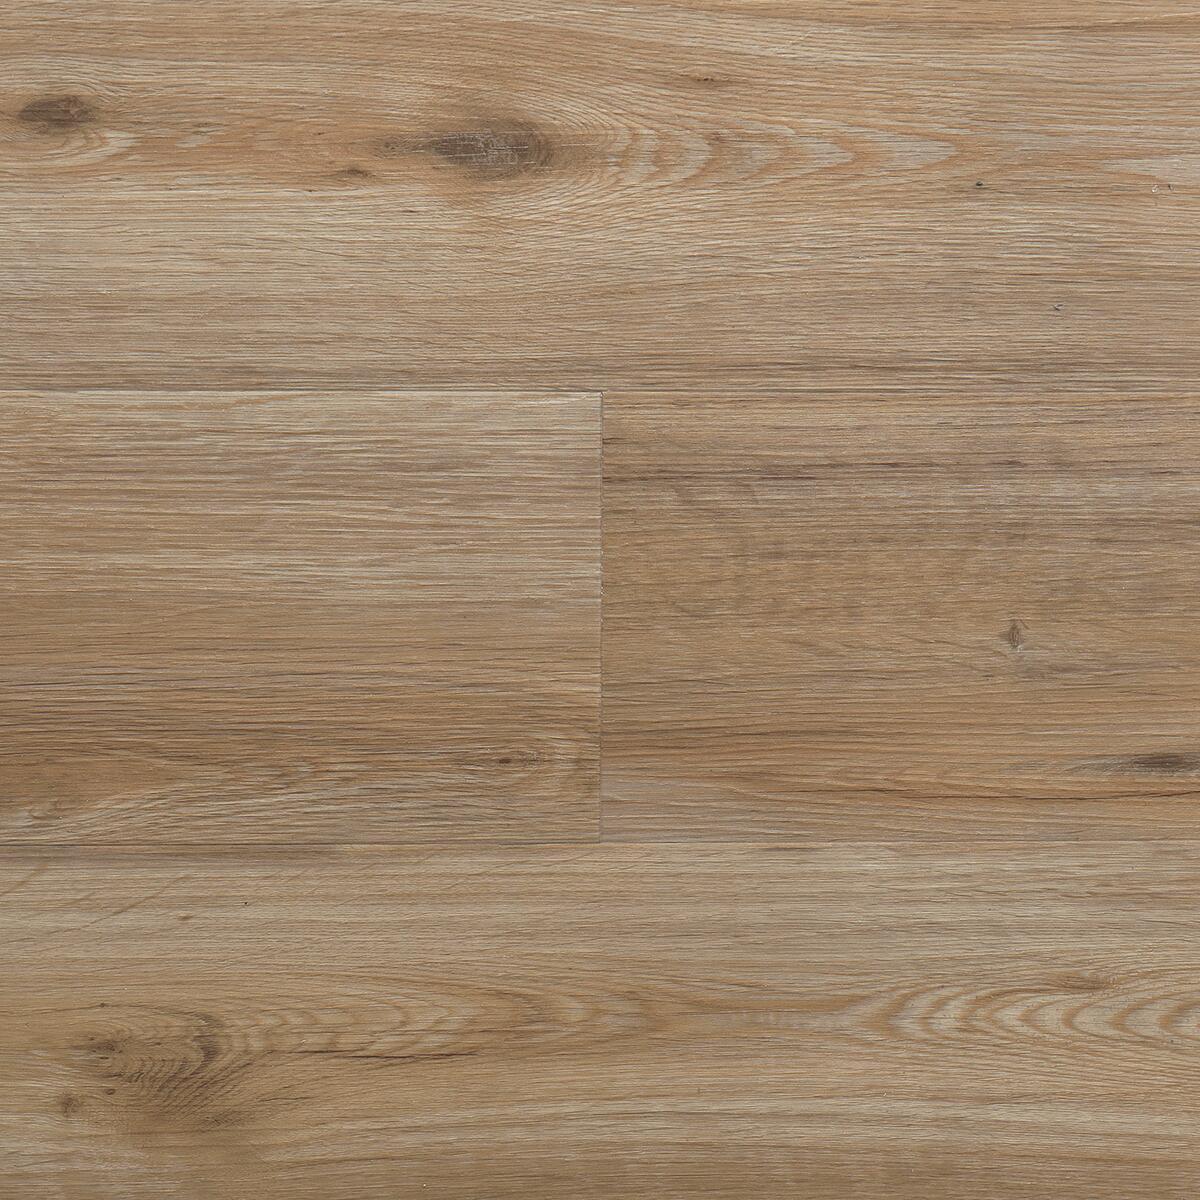 Pavimento SPC flottante clic+ Grenoble Sp 5 mm marrone - 2